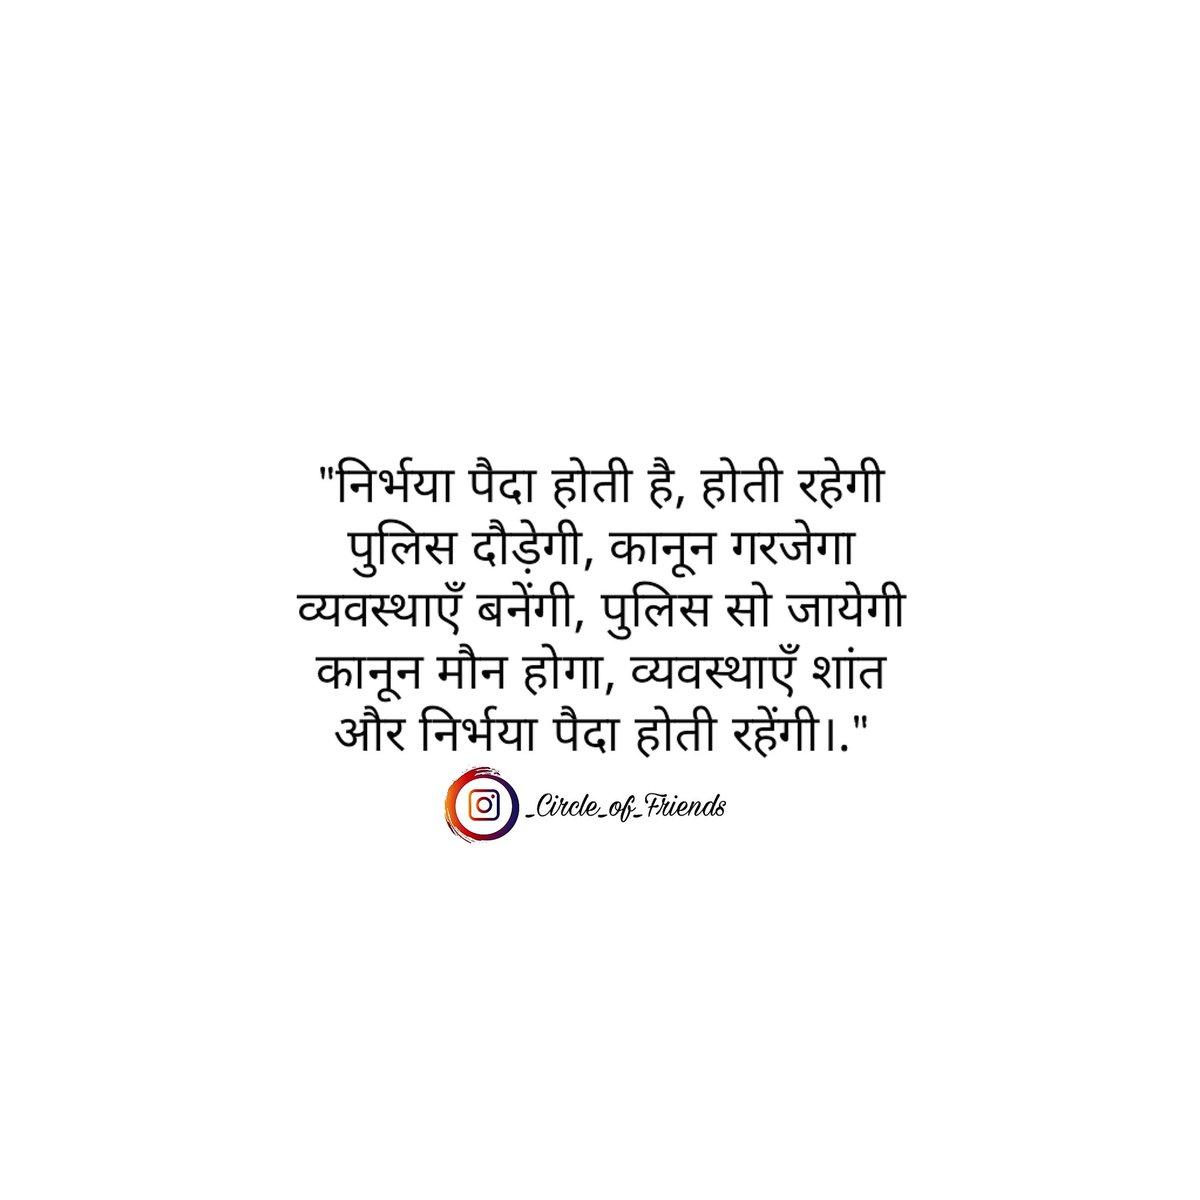 निर्भया पेदा होती हैं, होती रहेगी।  #india #भारत #indian #भारतीय #loveyourself💕#lifequotes #climbwithtricolor #indiannavy #indianairforce #indianarmy #unityindiversity #poems #कविता #narmada #ganga #touchthesky #servicebeforeself #द्रौपदी #शकुनि #मस्तक #indianconstitution 🇮🇳😇🤘 https://t.co/53NIHdMOEQ